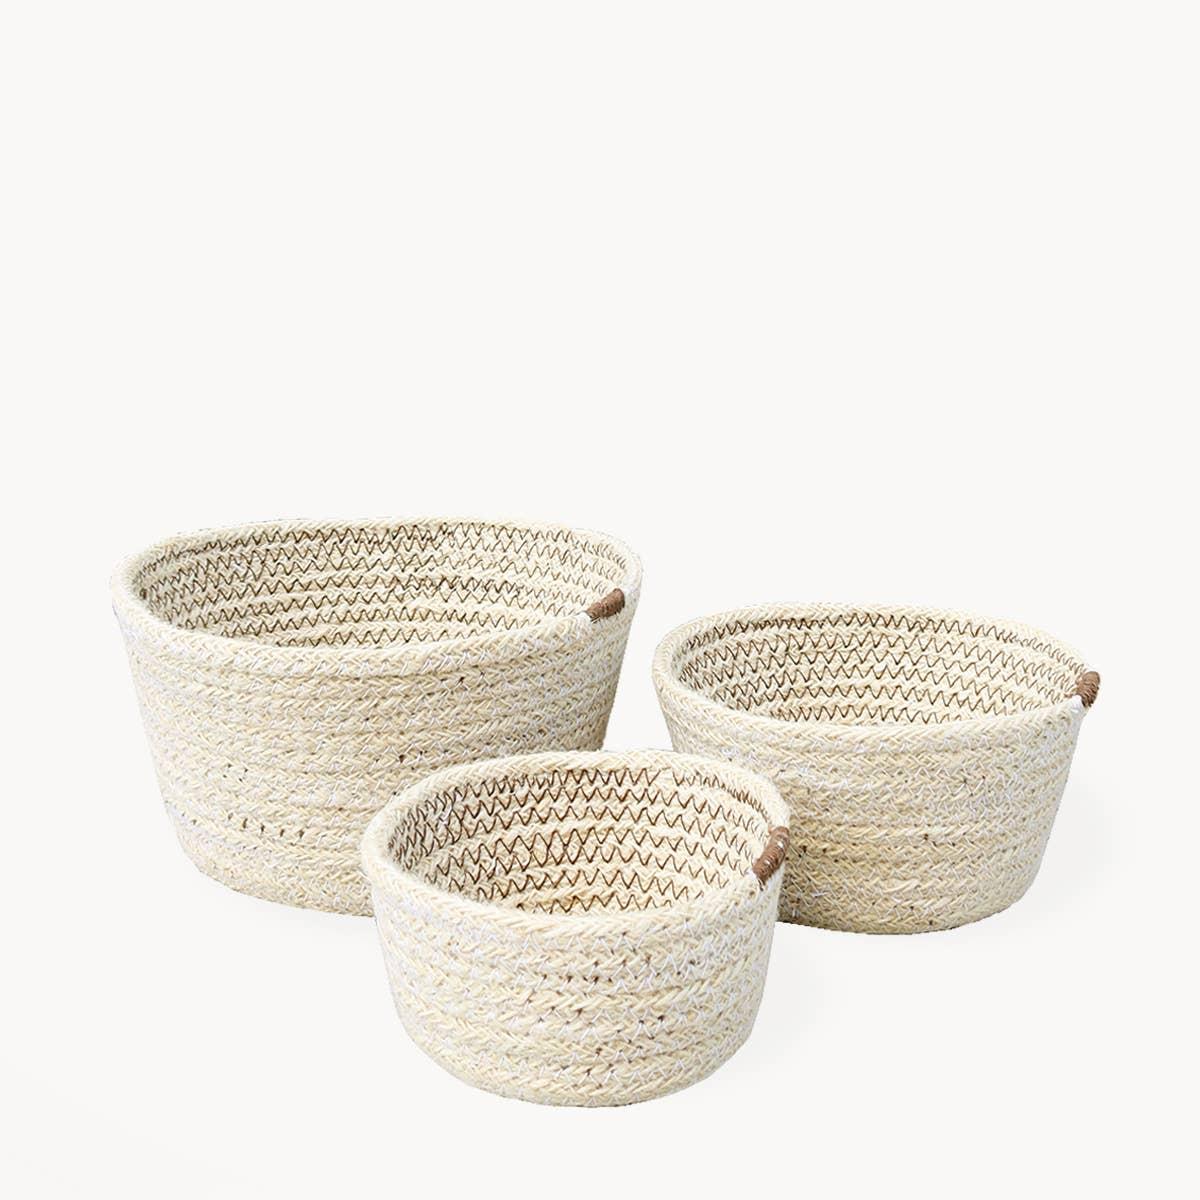 Amari Bowl - Brown (Set of 3) | Trada Marketplace